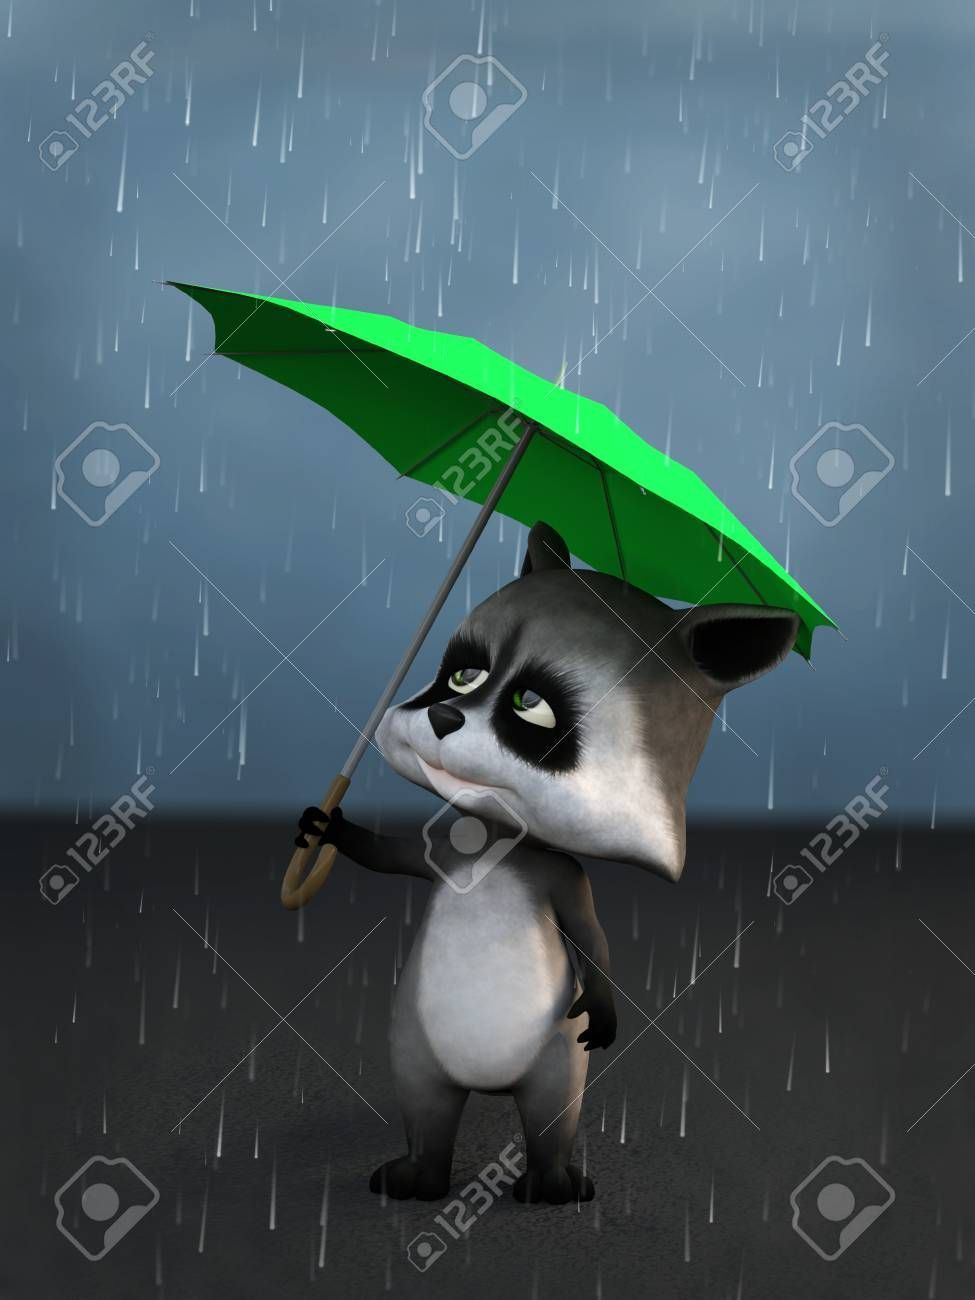 3D rendering of a cute cartoon raccoon holding a green umbrella in the rain. , #AFFILIATE, #cartoon, #raccoon, #rendering, #cute, #umbrella #cuteumbrellas 3D rendering of a cute cartoon raccoon holding a green umbrella in the rain. , #AFFILIATE, #cartoon, #raccoon, #rendering, #cute, #umbrella #cuteumbrellas 3D rendering of a cute cartoon raccoon holding a green umbrella in the rain. , #AFFILIATE, #cartoon, #raccoon, #rendering, #cute, #umbrella #cuteumbrellas 3D rendering of a cute cartoon racc #cuteumbrellas